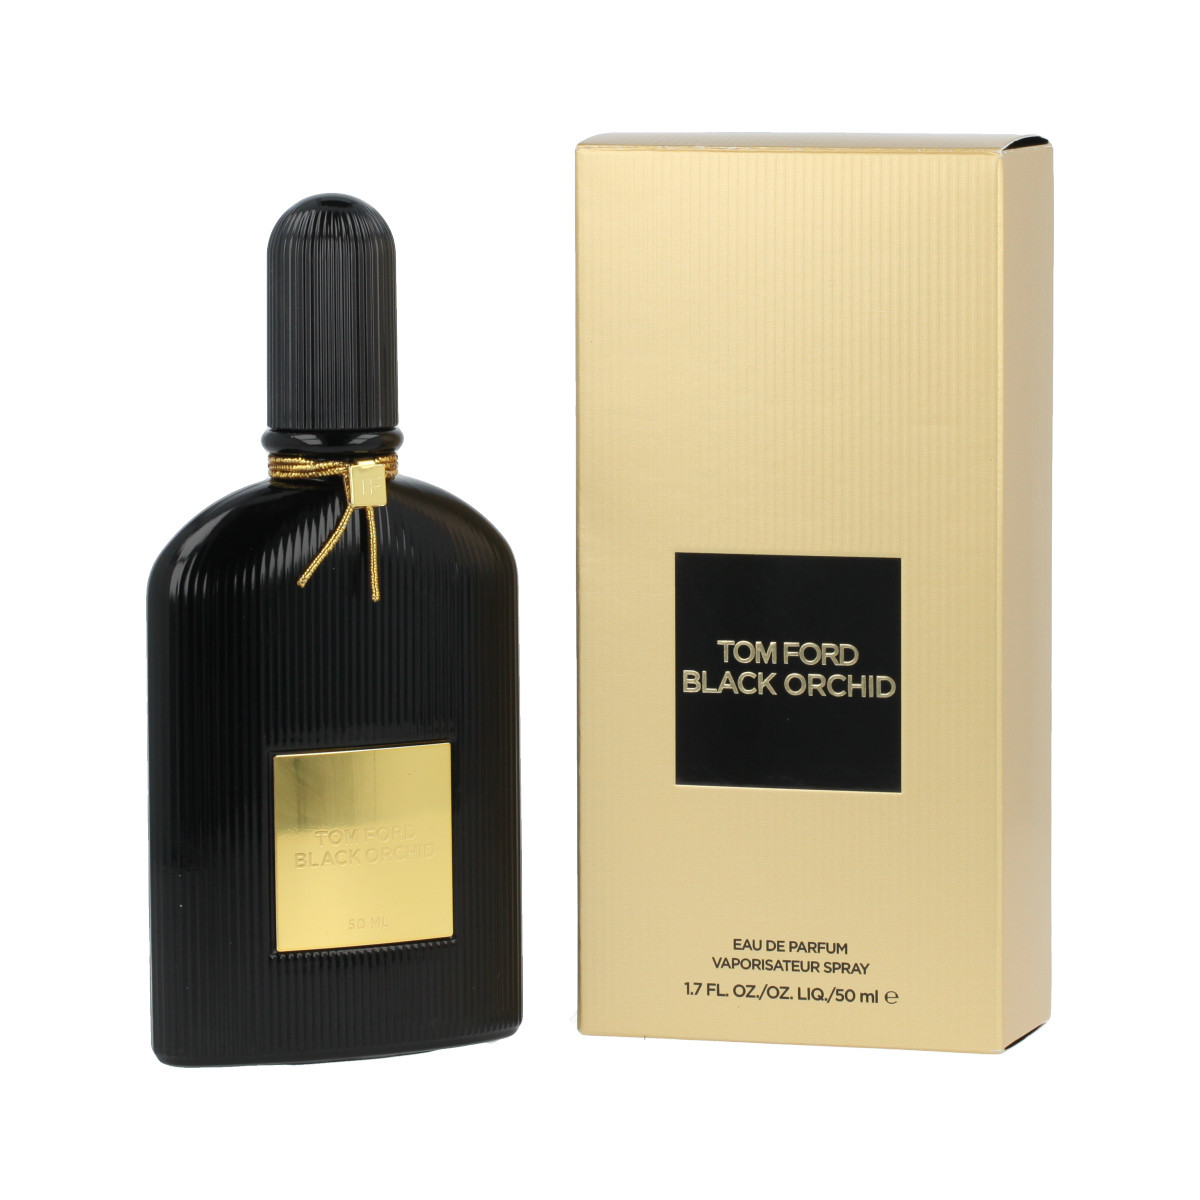 tom ford black orchid eau de parfum 50 ml woman black. Black Bedroom Furniture Sets. Home Design Ideas